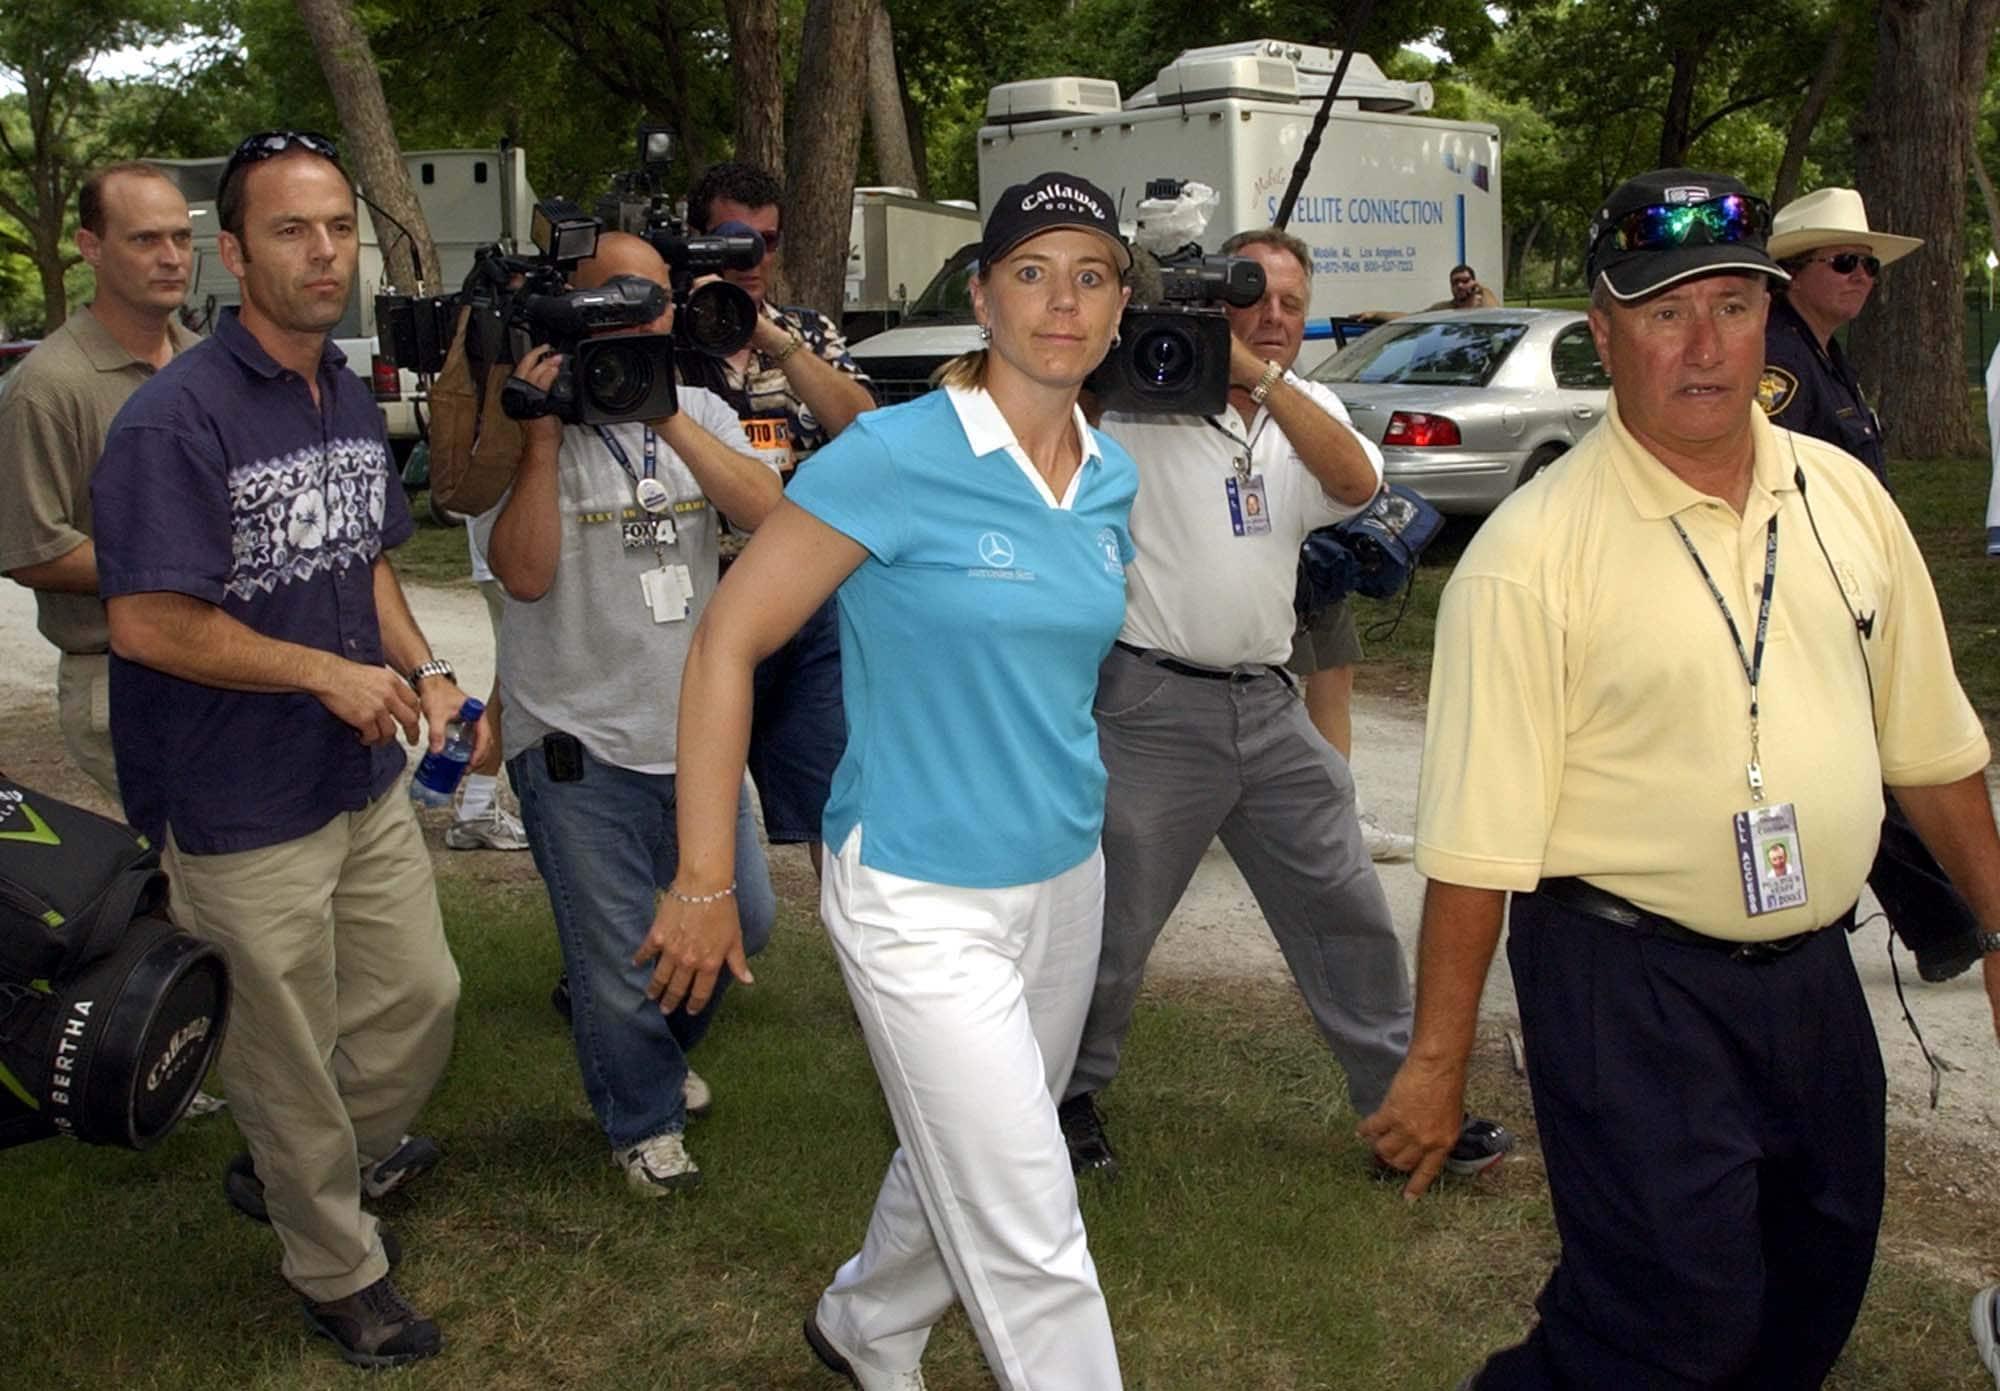 1. 2003: Annika tests herself